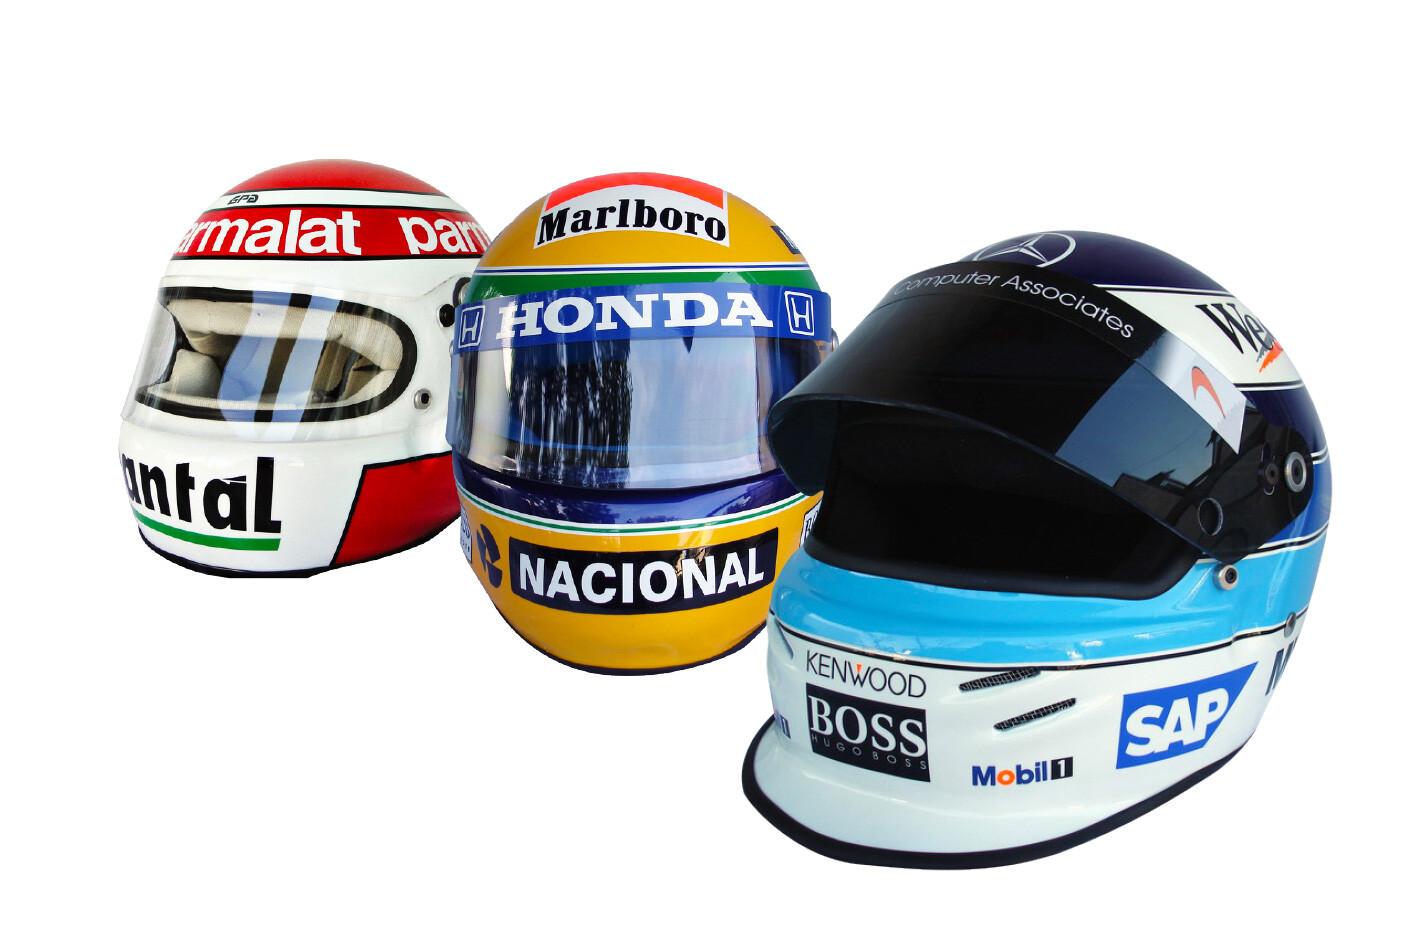 Topgear Helmet Jpg